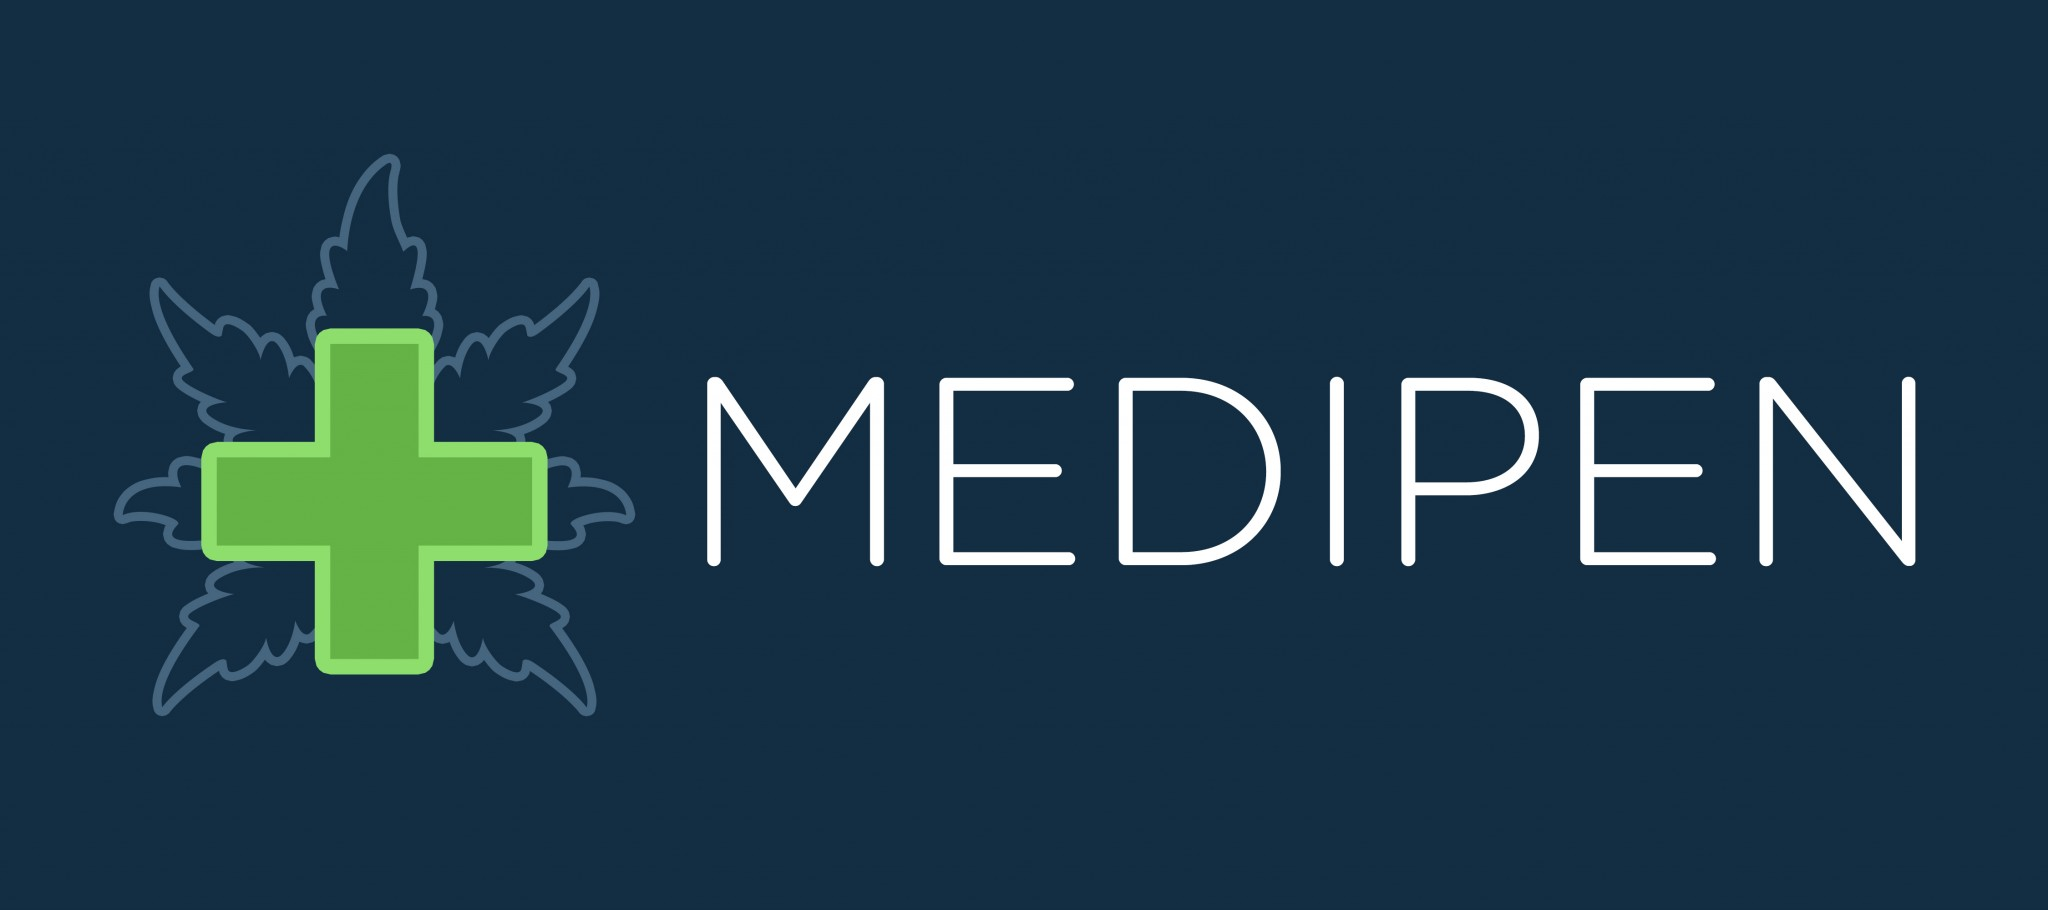 Medipen CBD Vaporiser, Medipen CBD Vaporiser Review